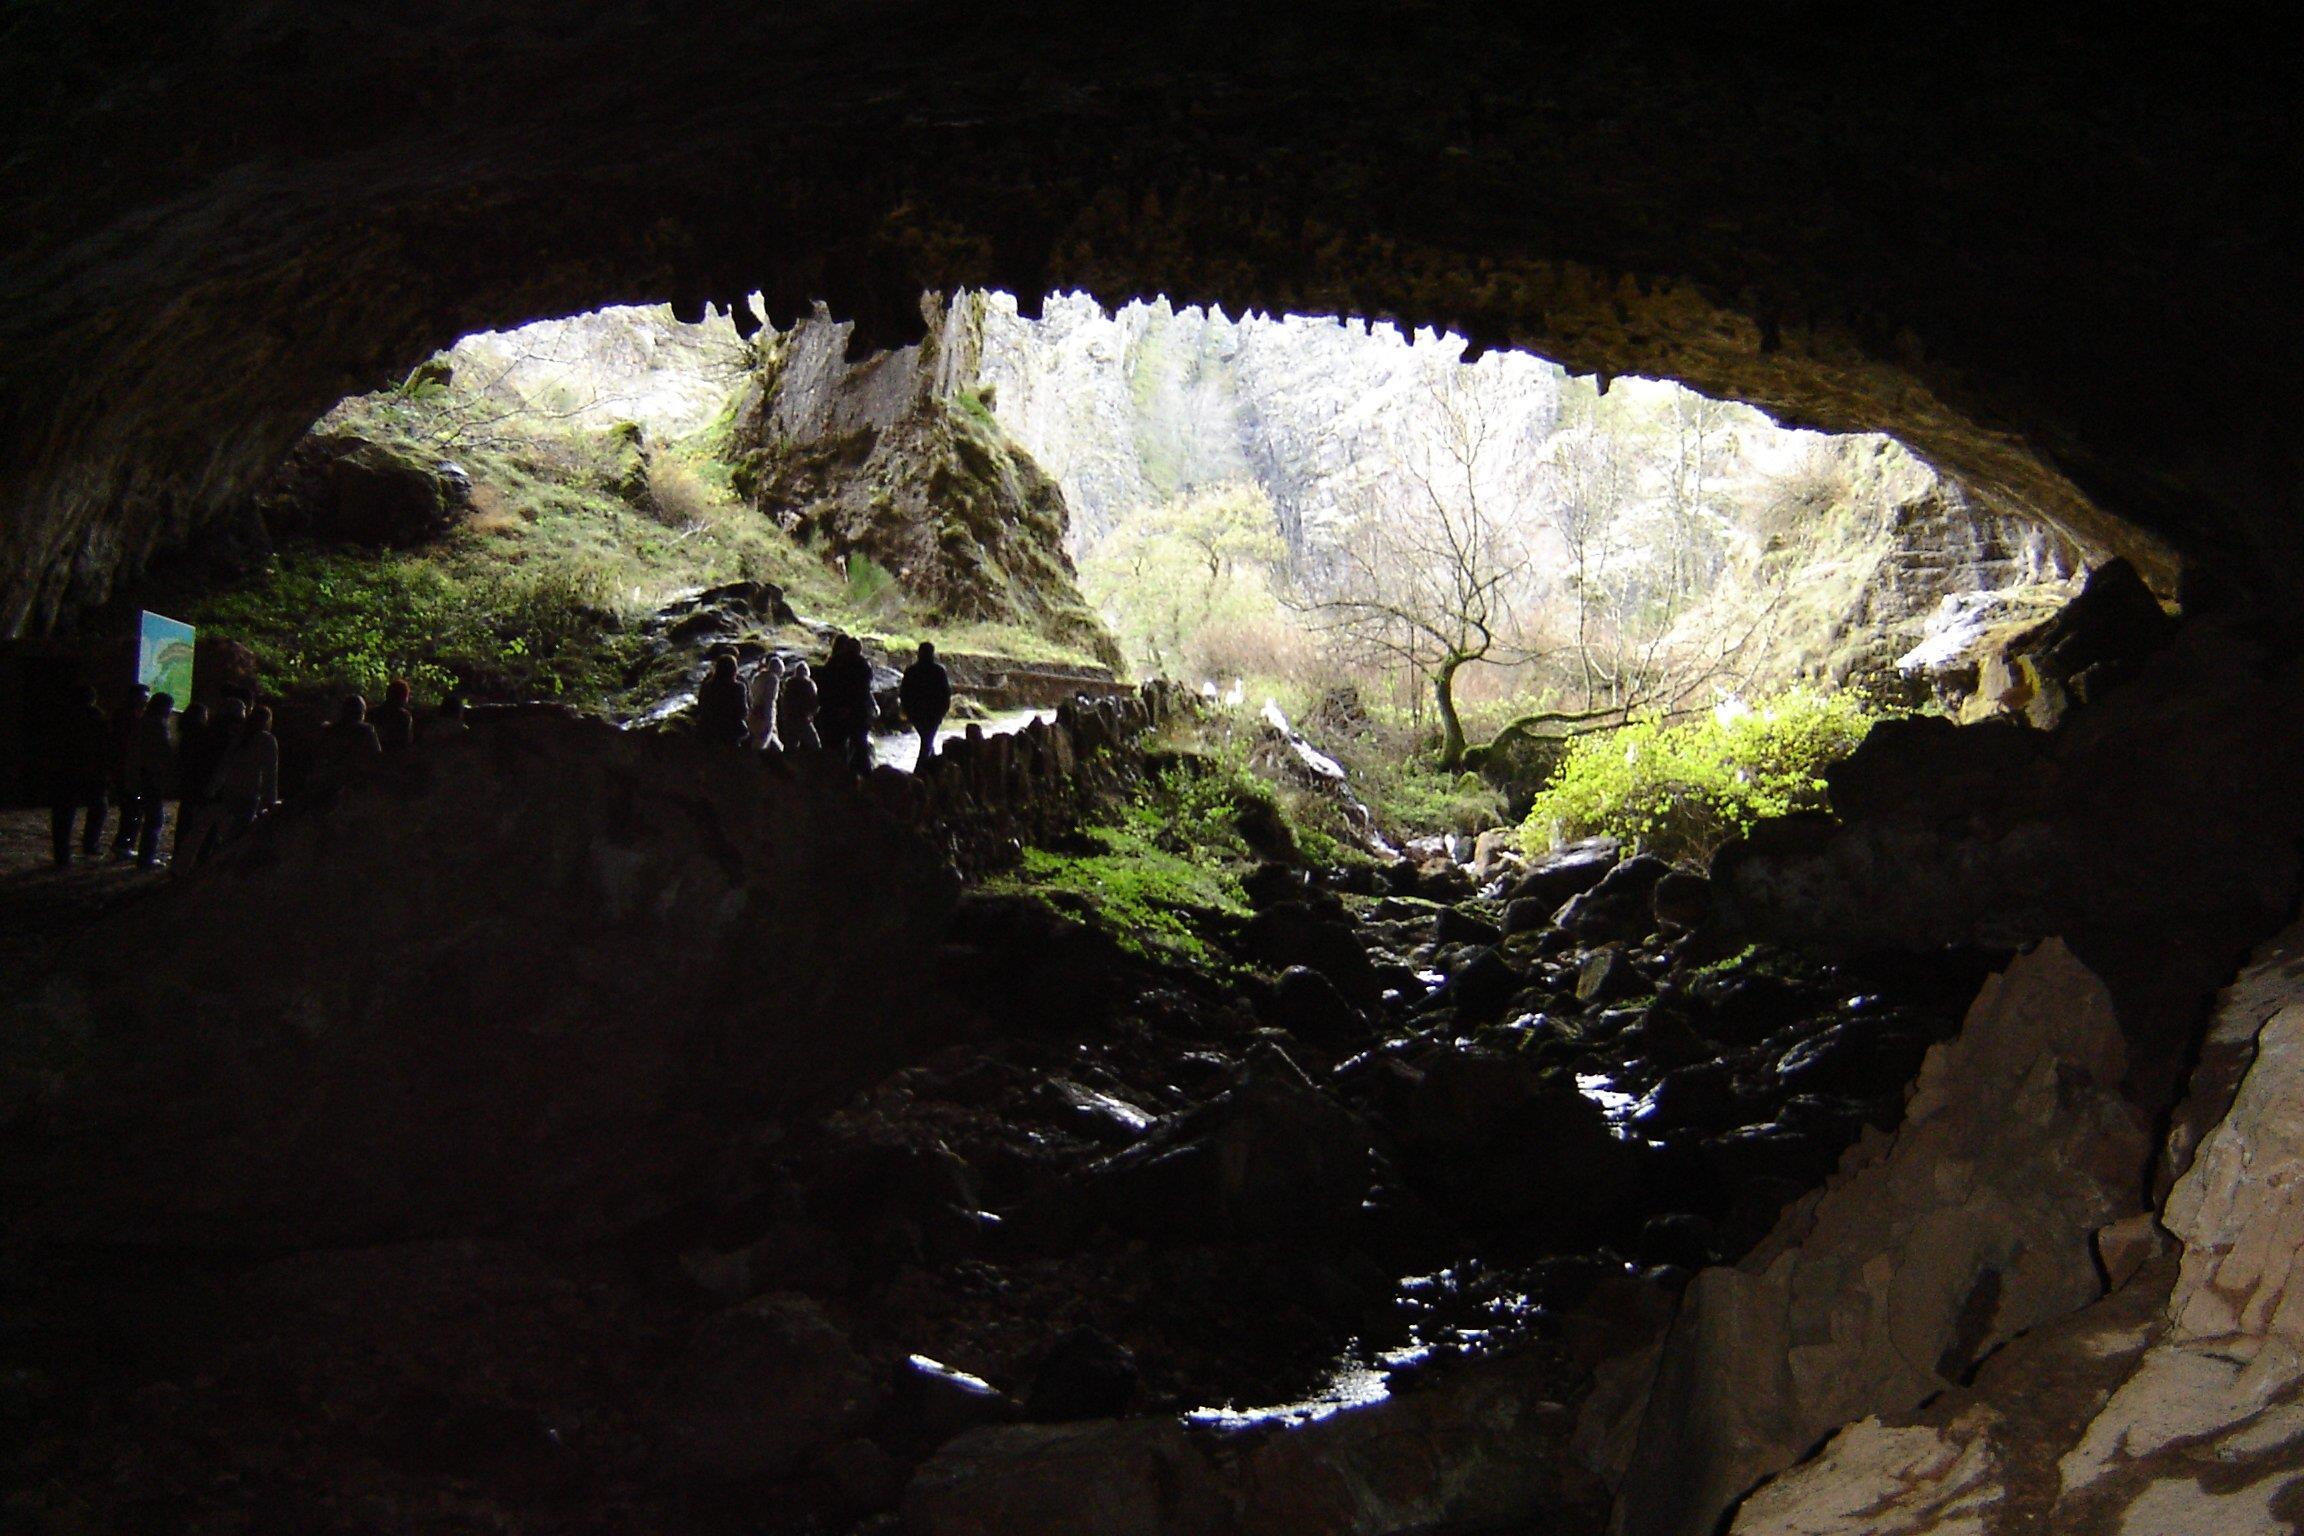 Excursion-to-Valporquero-Cave-3